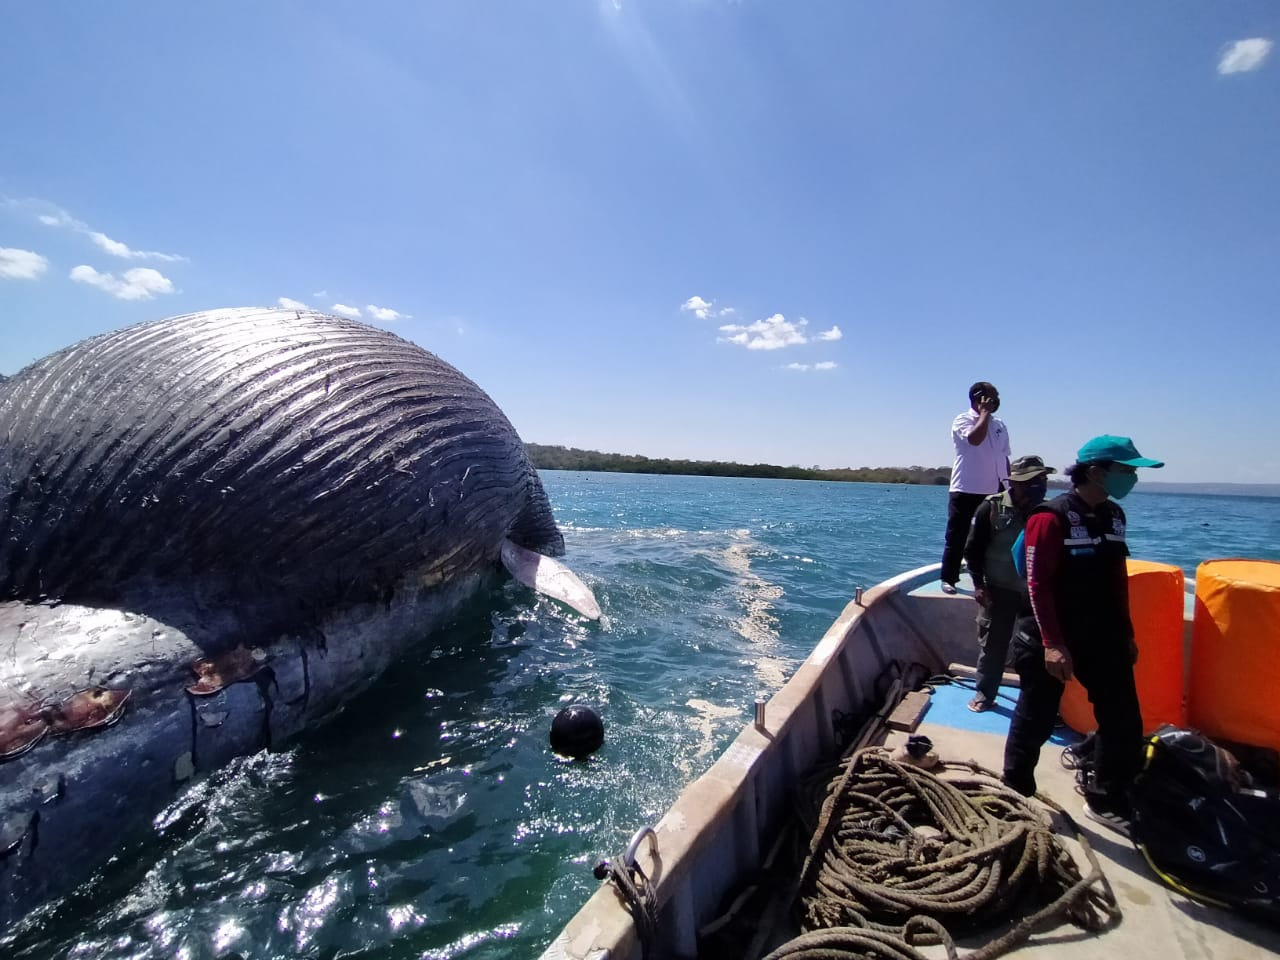 Upaya Penanganan Paus Biru yang Mati dan Terdampar di Perairan Teluk Kupang